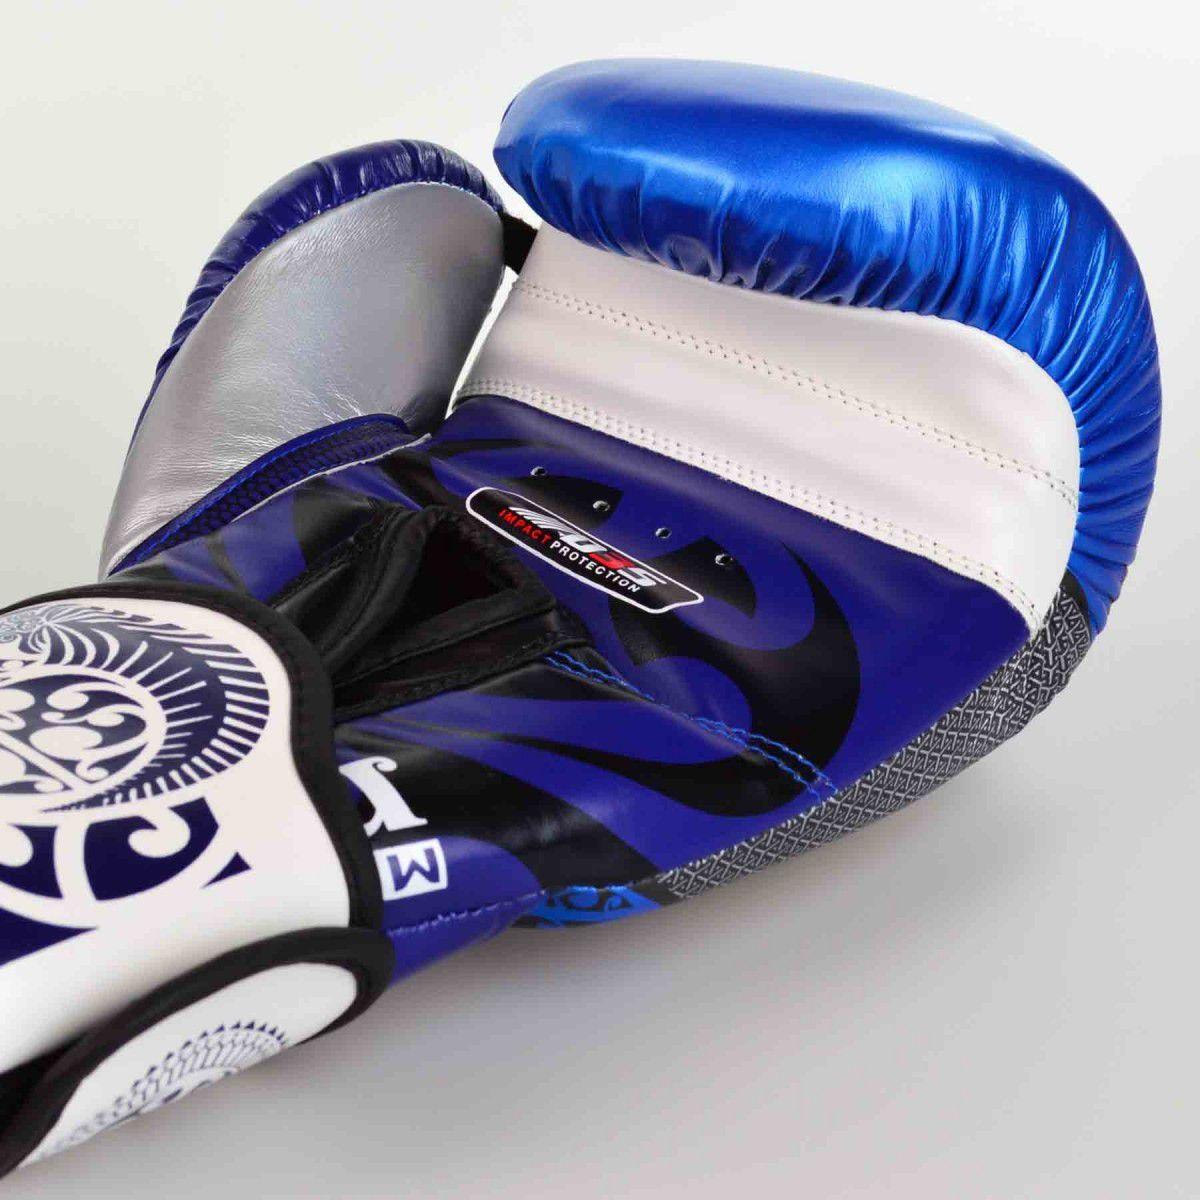 Luvas Boxe / Muay Thai - Maori - Best Defense - Azul - 10/12/14 OZ .  - Loja do Competidor